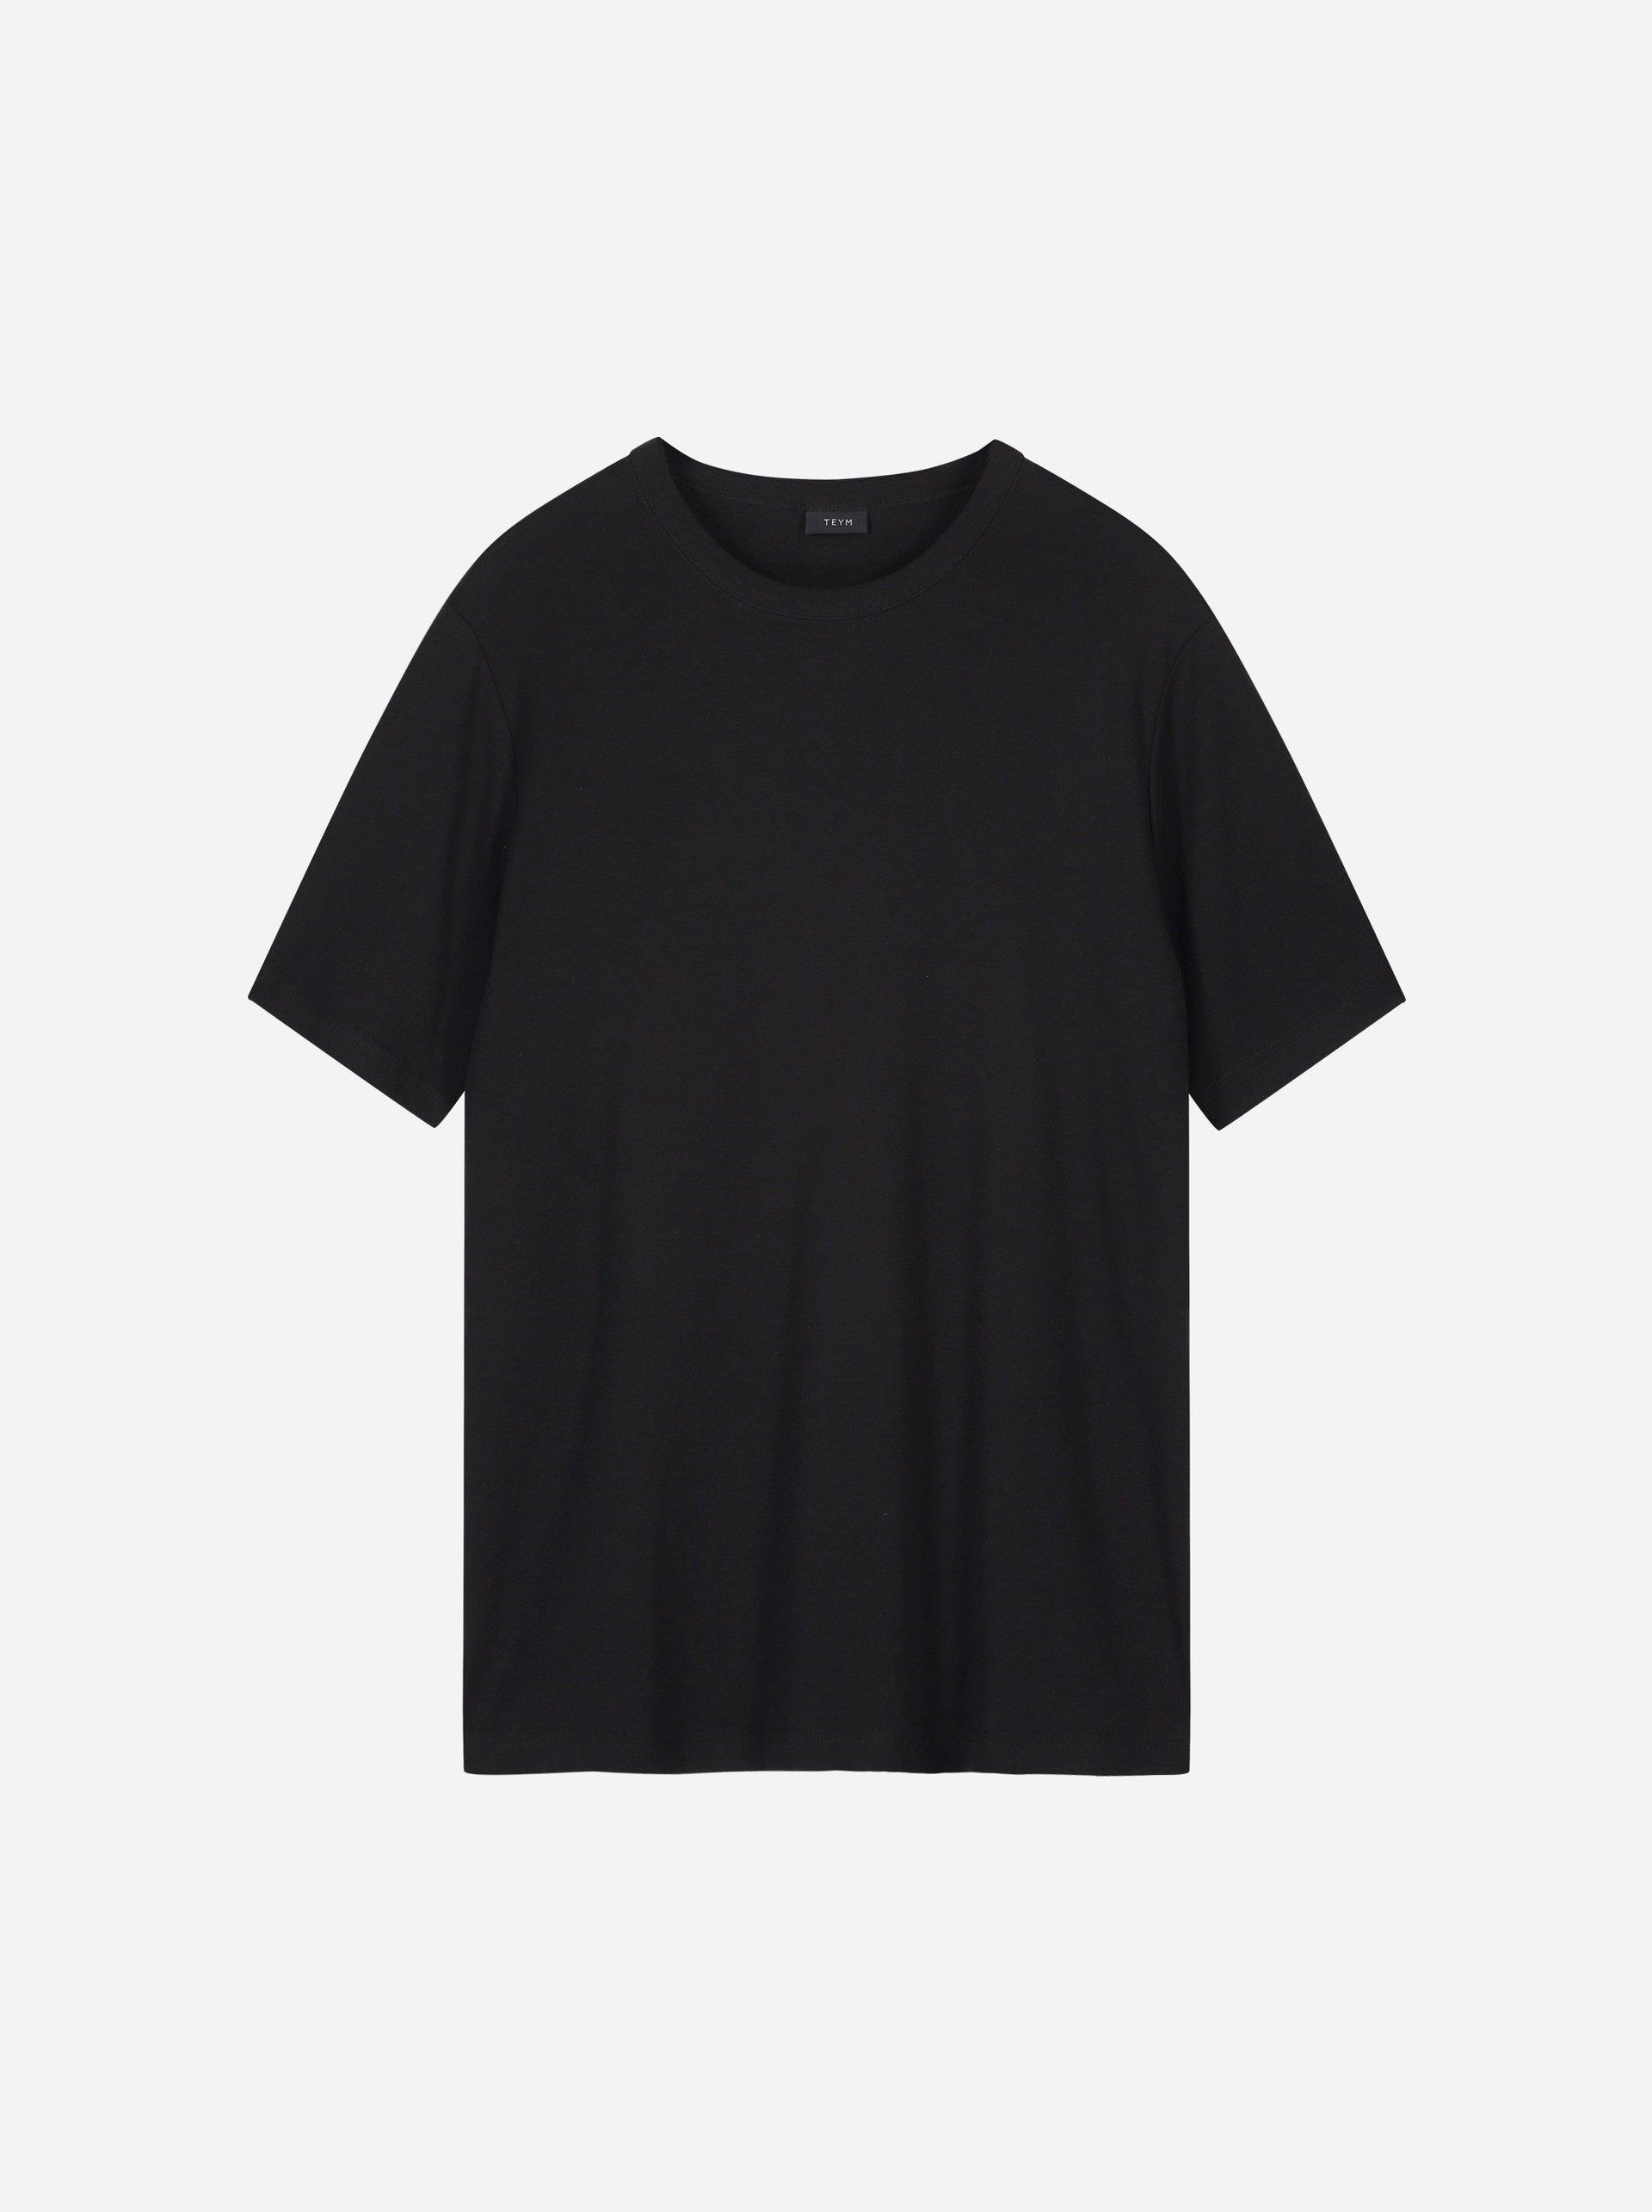 Teym - The T-Shirt - Men - Black - 5